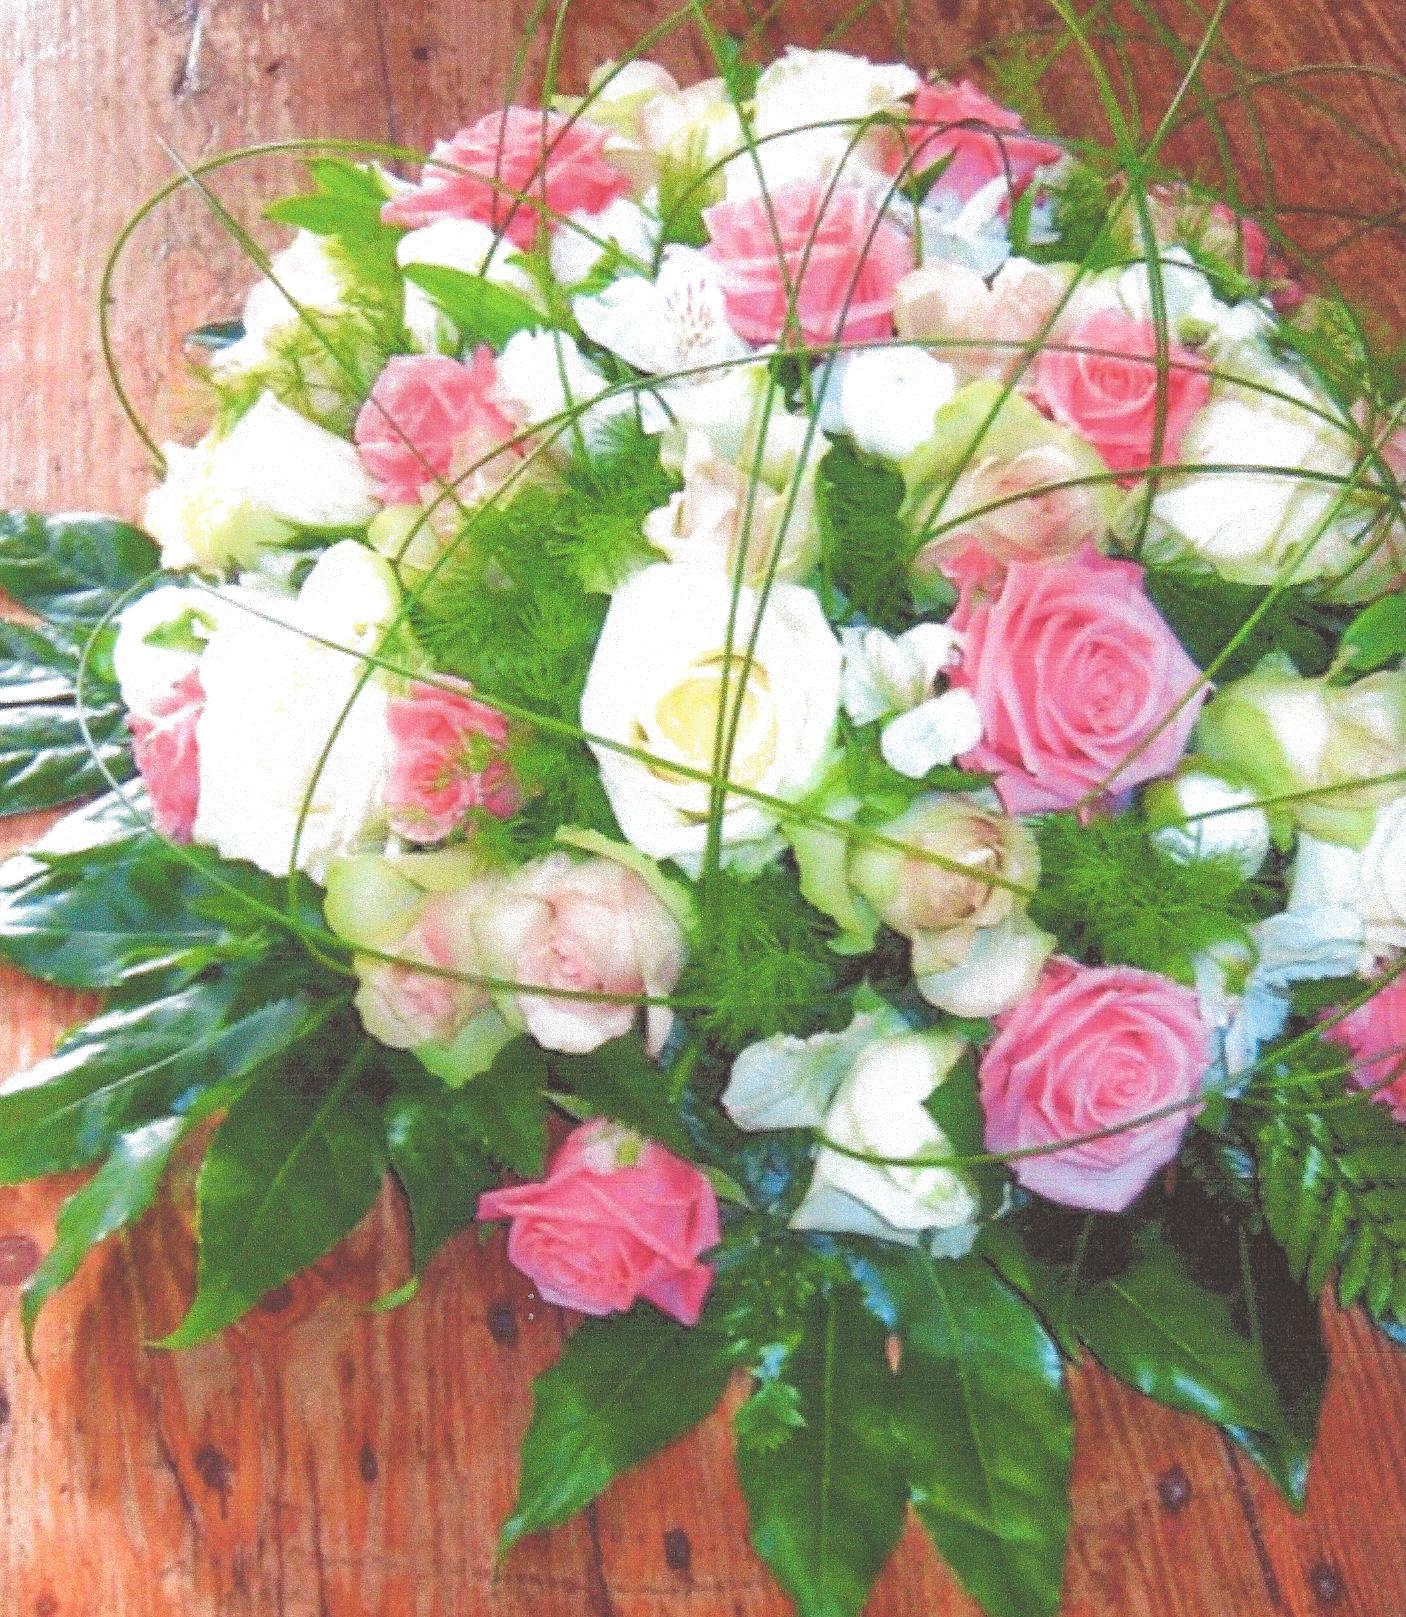 NR 04 bloemstuk rond gemengde kleuren rozen flexigras 90 euro